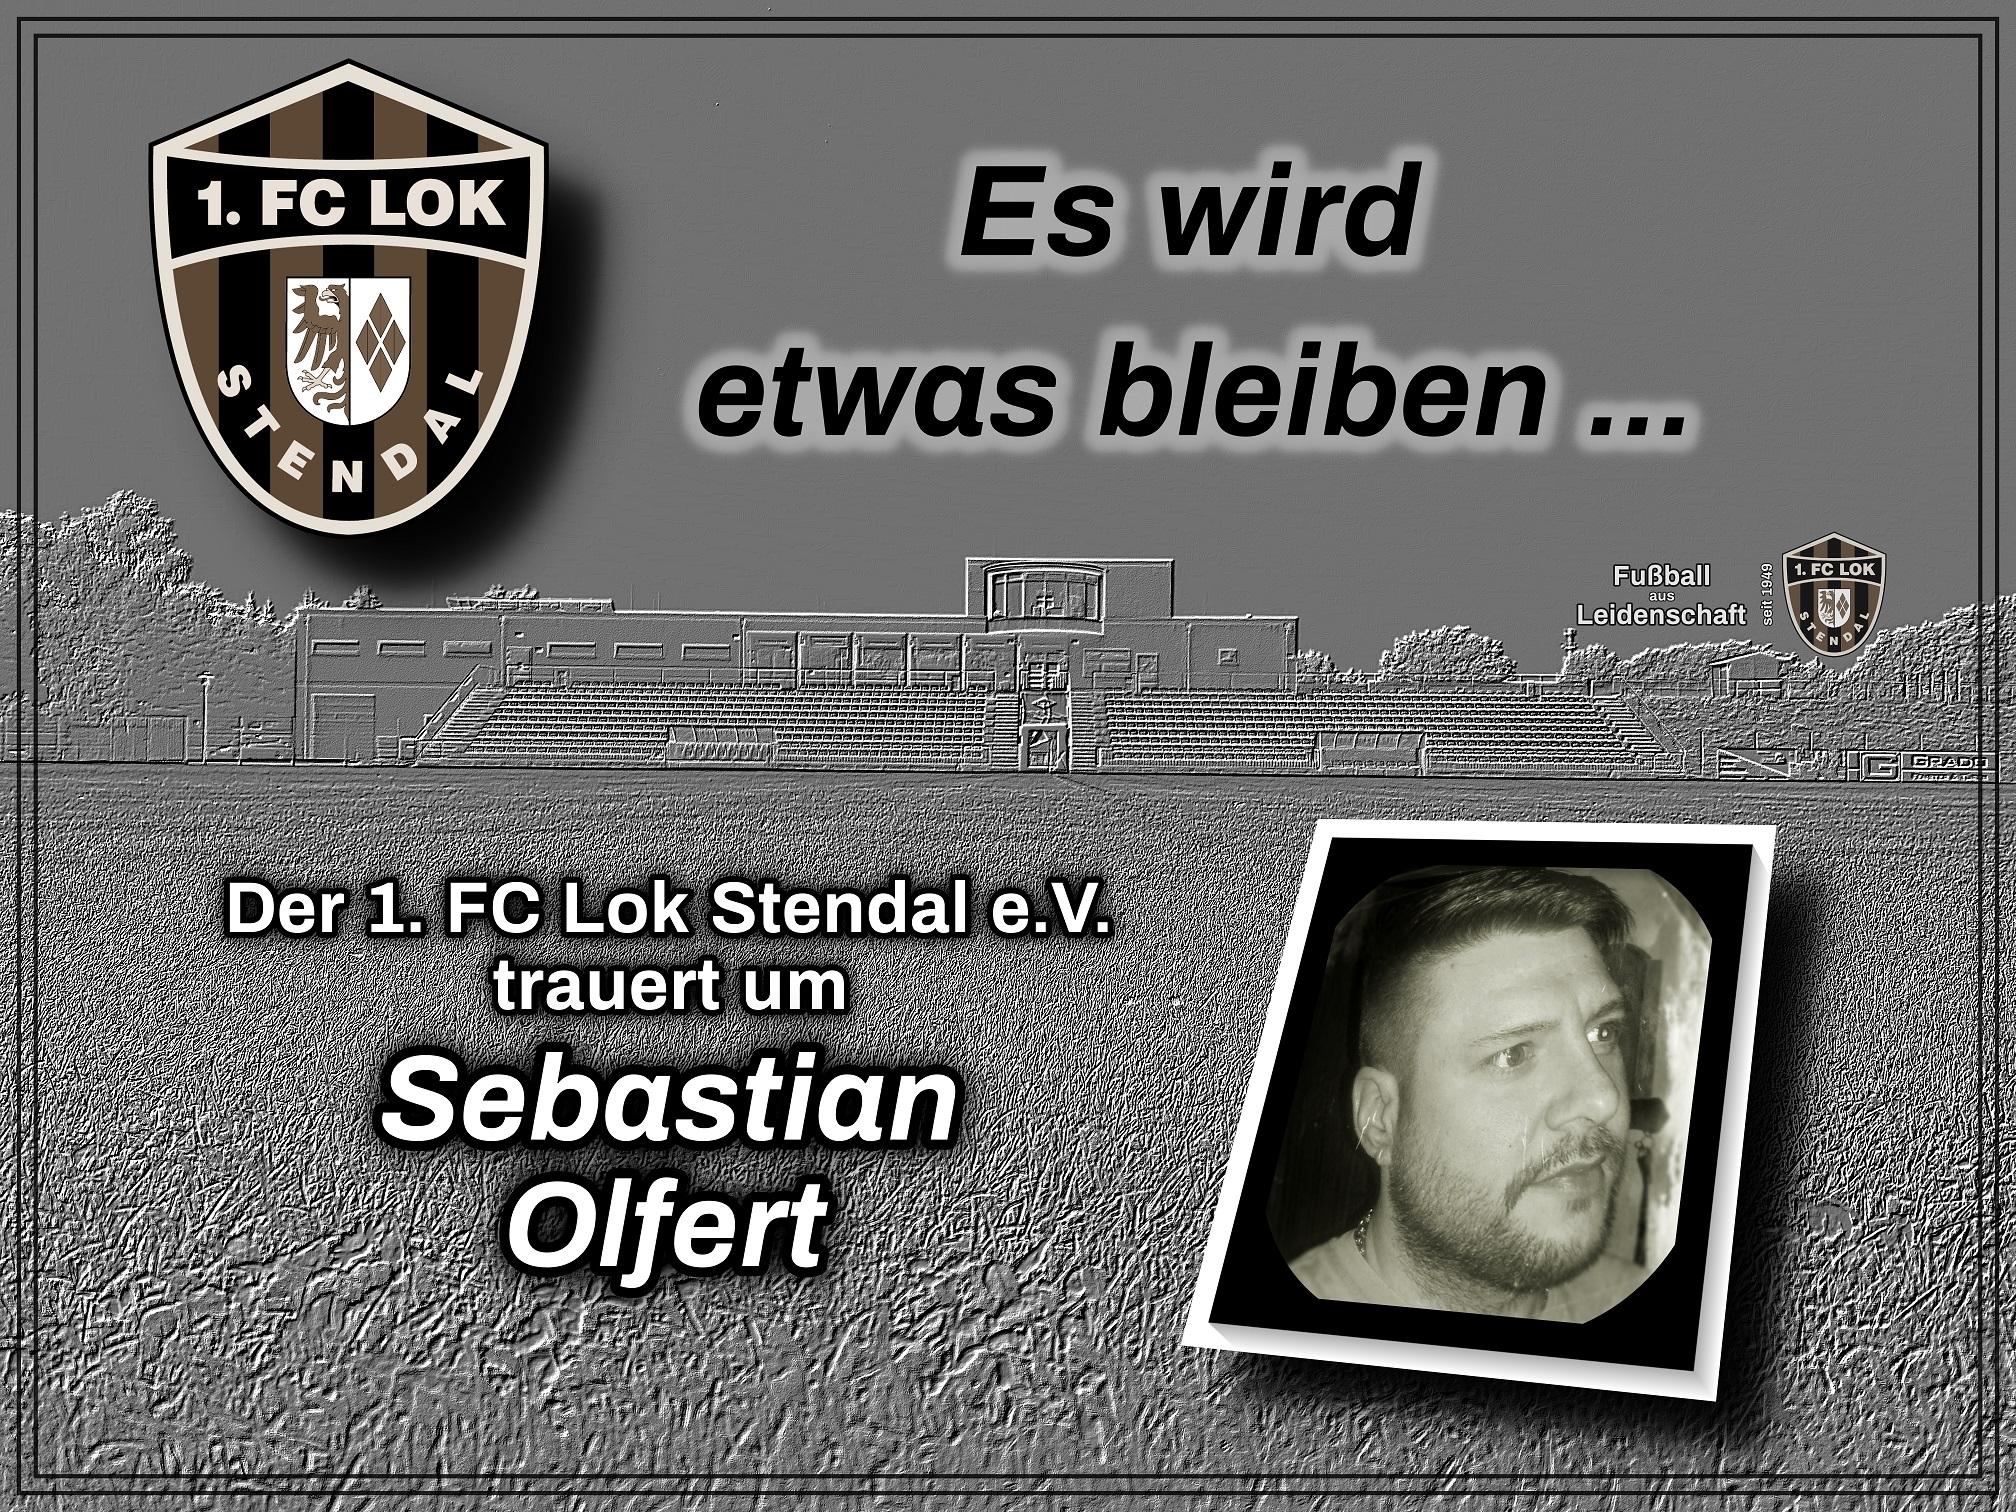 Wir trauern - 1. FC Lok Stendal